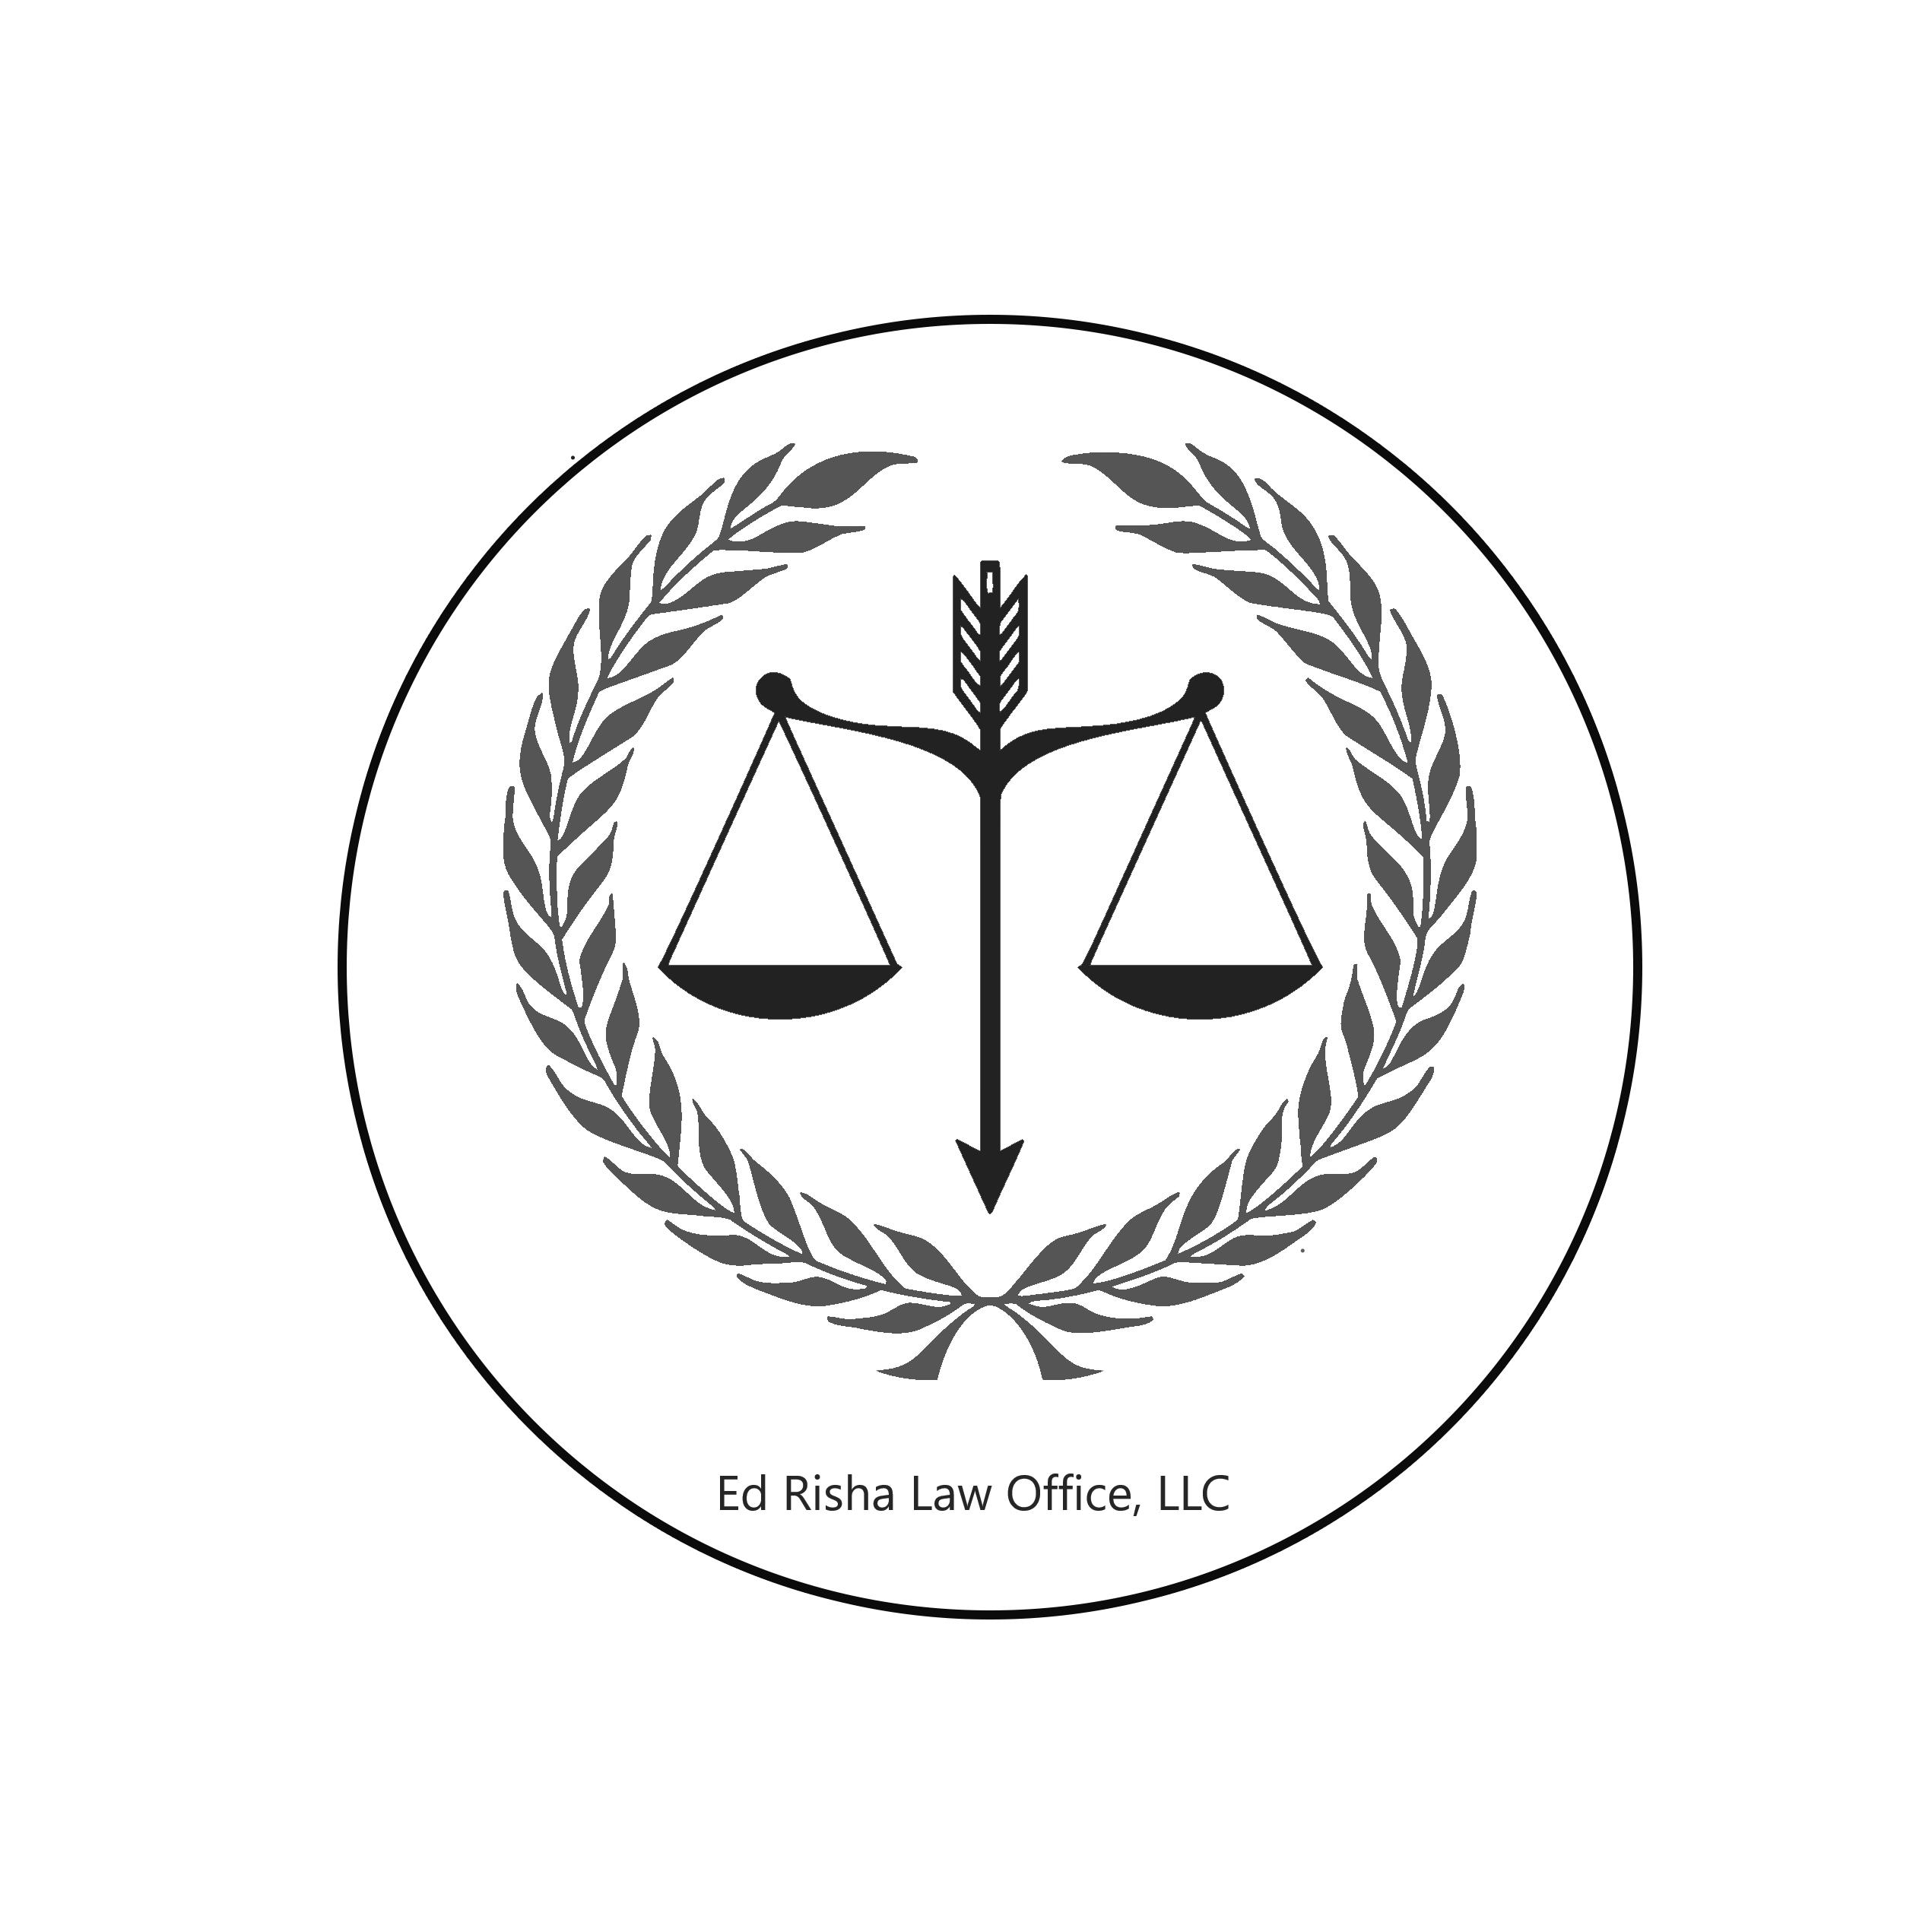 Ed Risha Law Office, LLC.